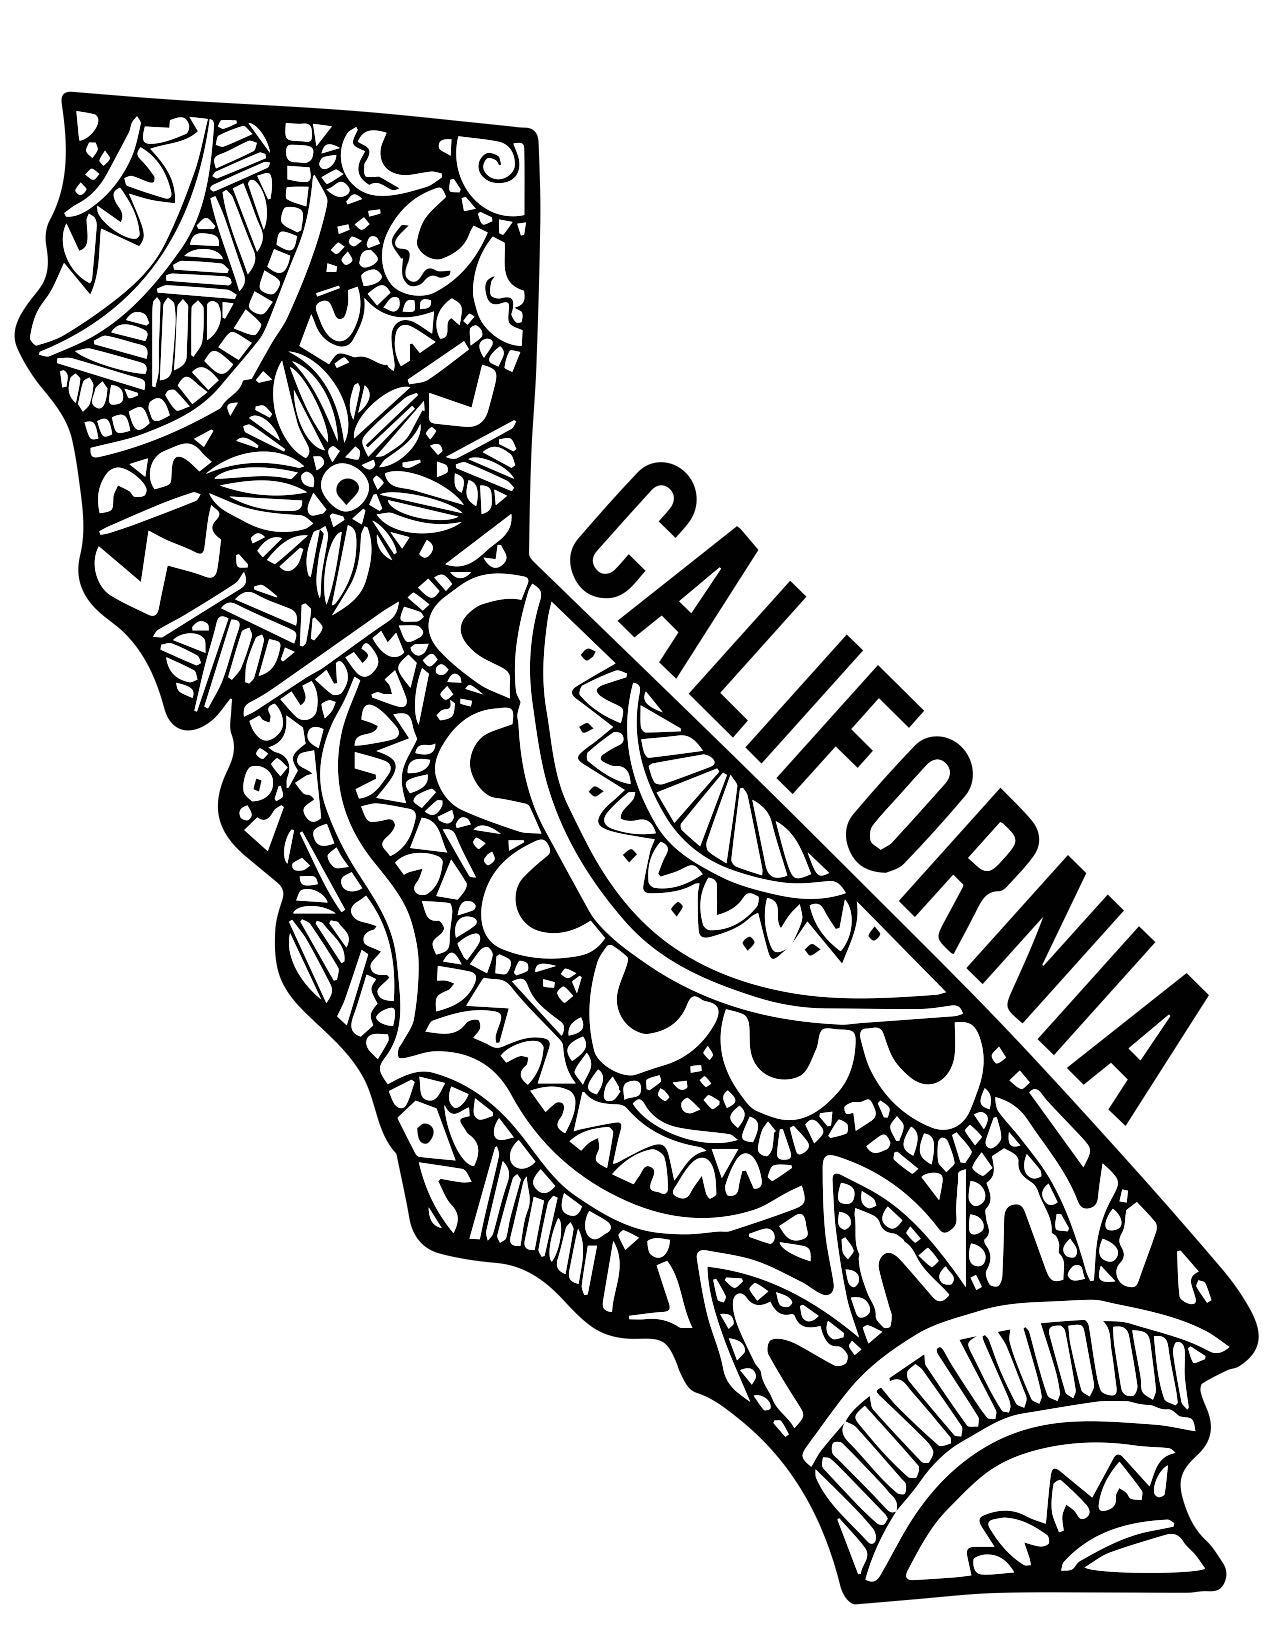 State Of California Drawing At Getdrawings